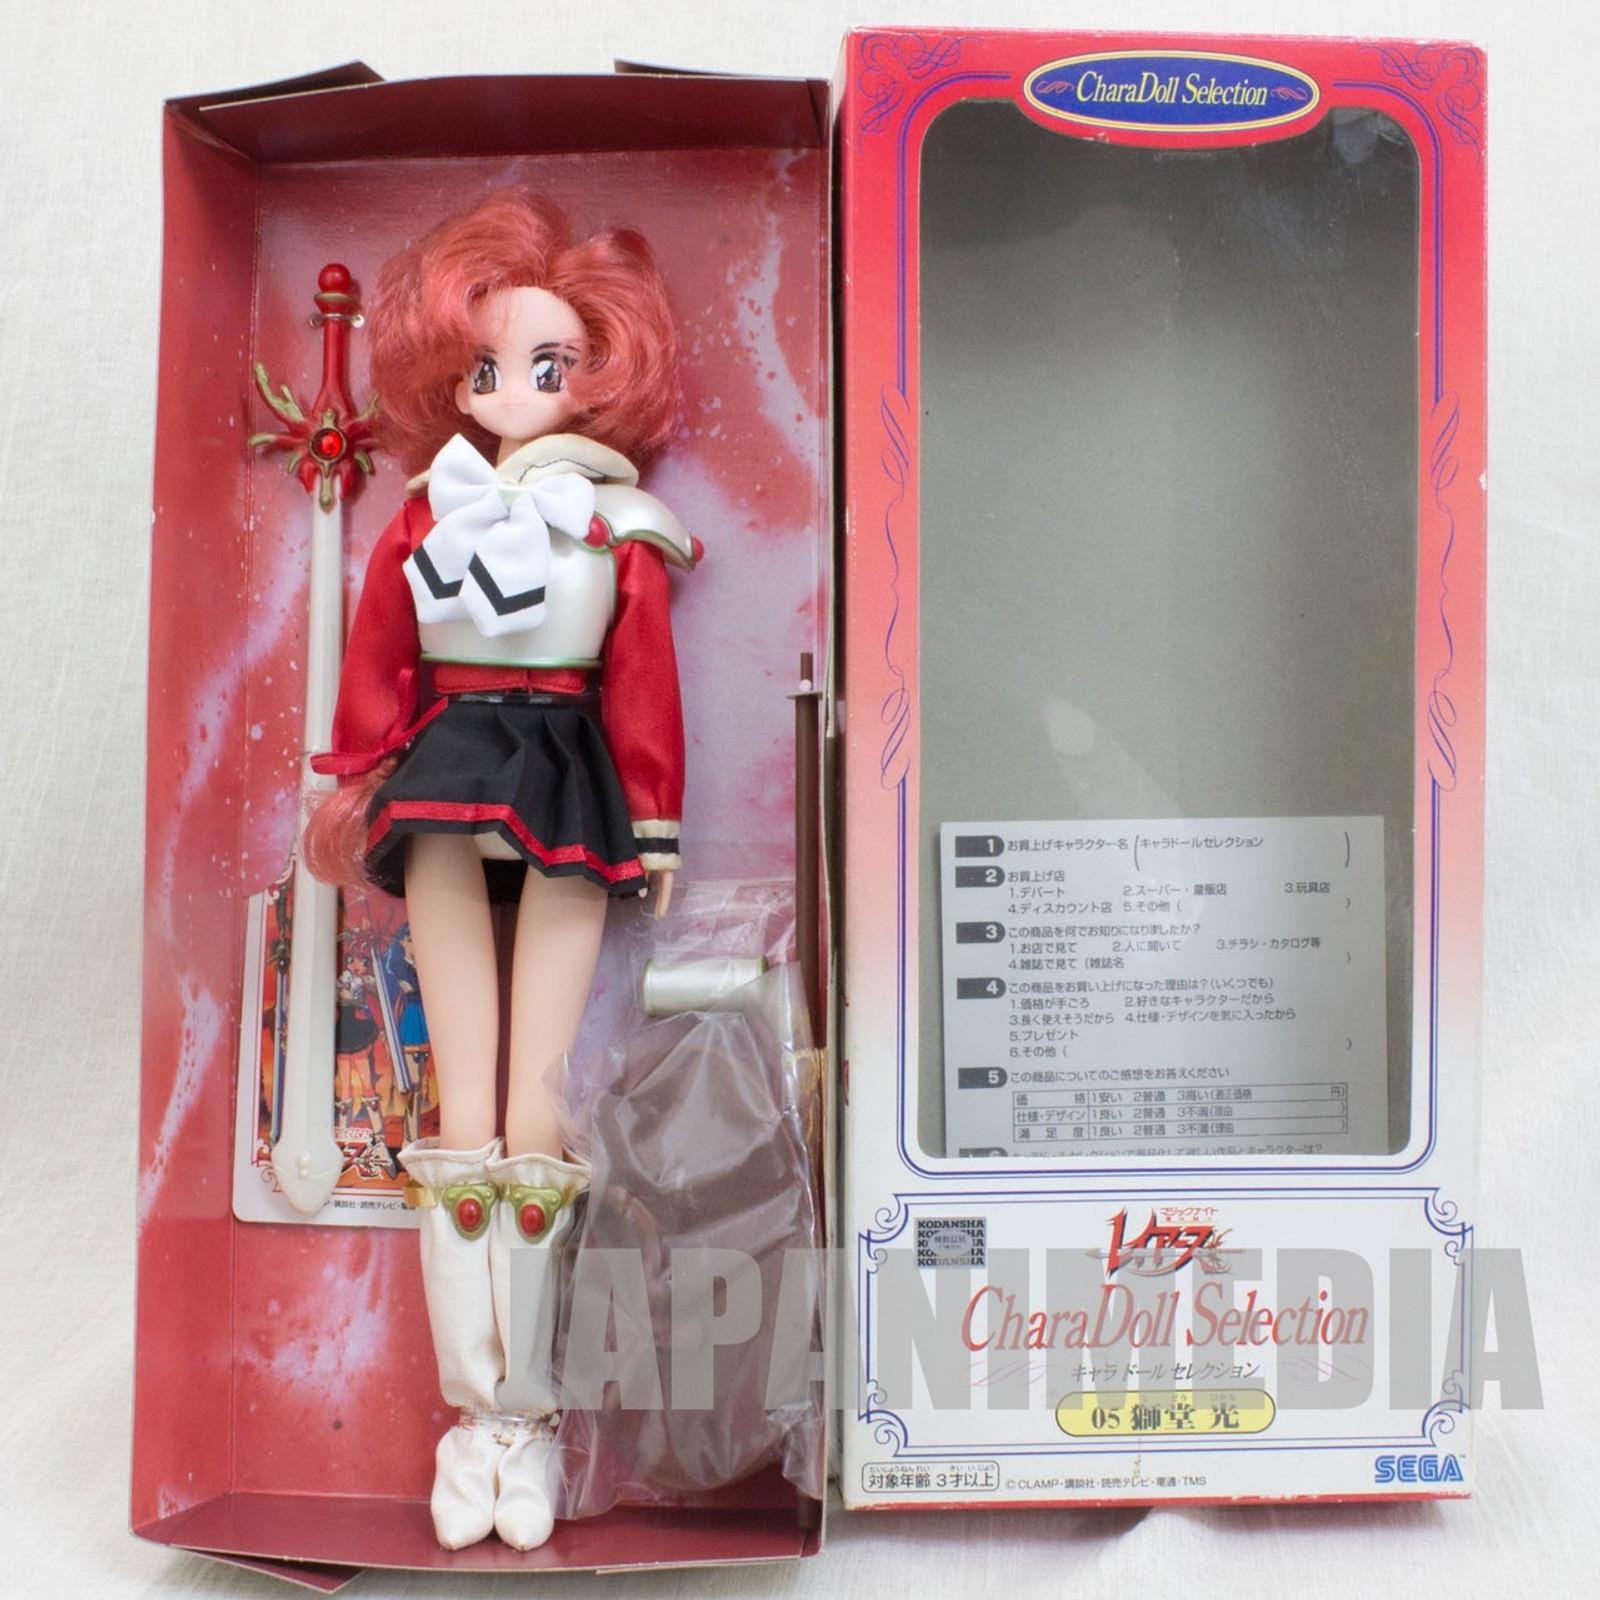 Magic Knight Rayearth Hikaru Shido Chara Doll Selection Figure CLAMP SEGA JAPAN ANIME